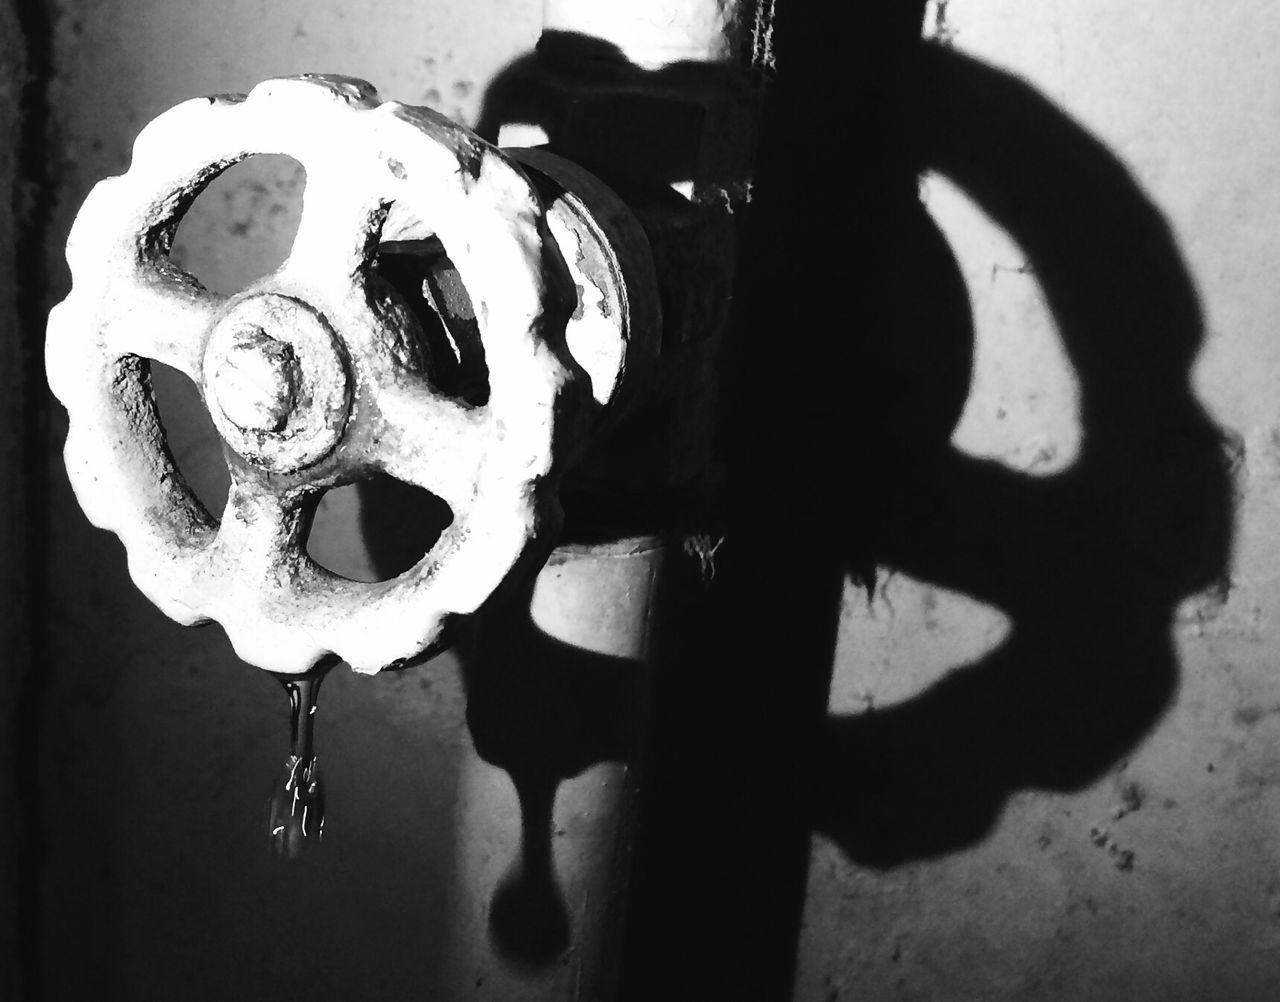 Close-up Popolar Photo Master_shots Eyeemphoto Creativity save water save life's Shadow Reflection Week On Eyeem Shootermag New Talent This Week Blackandwhite Photography Macro New Talents The Week On EyeEm